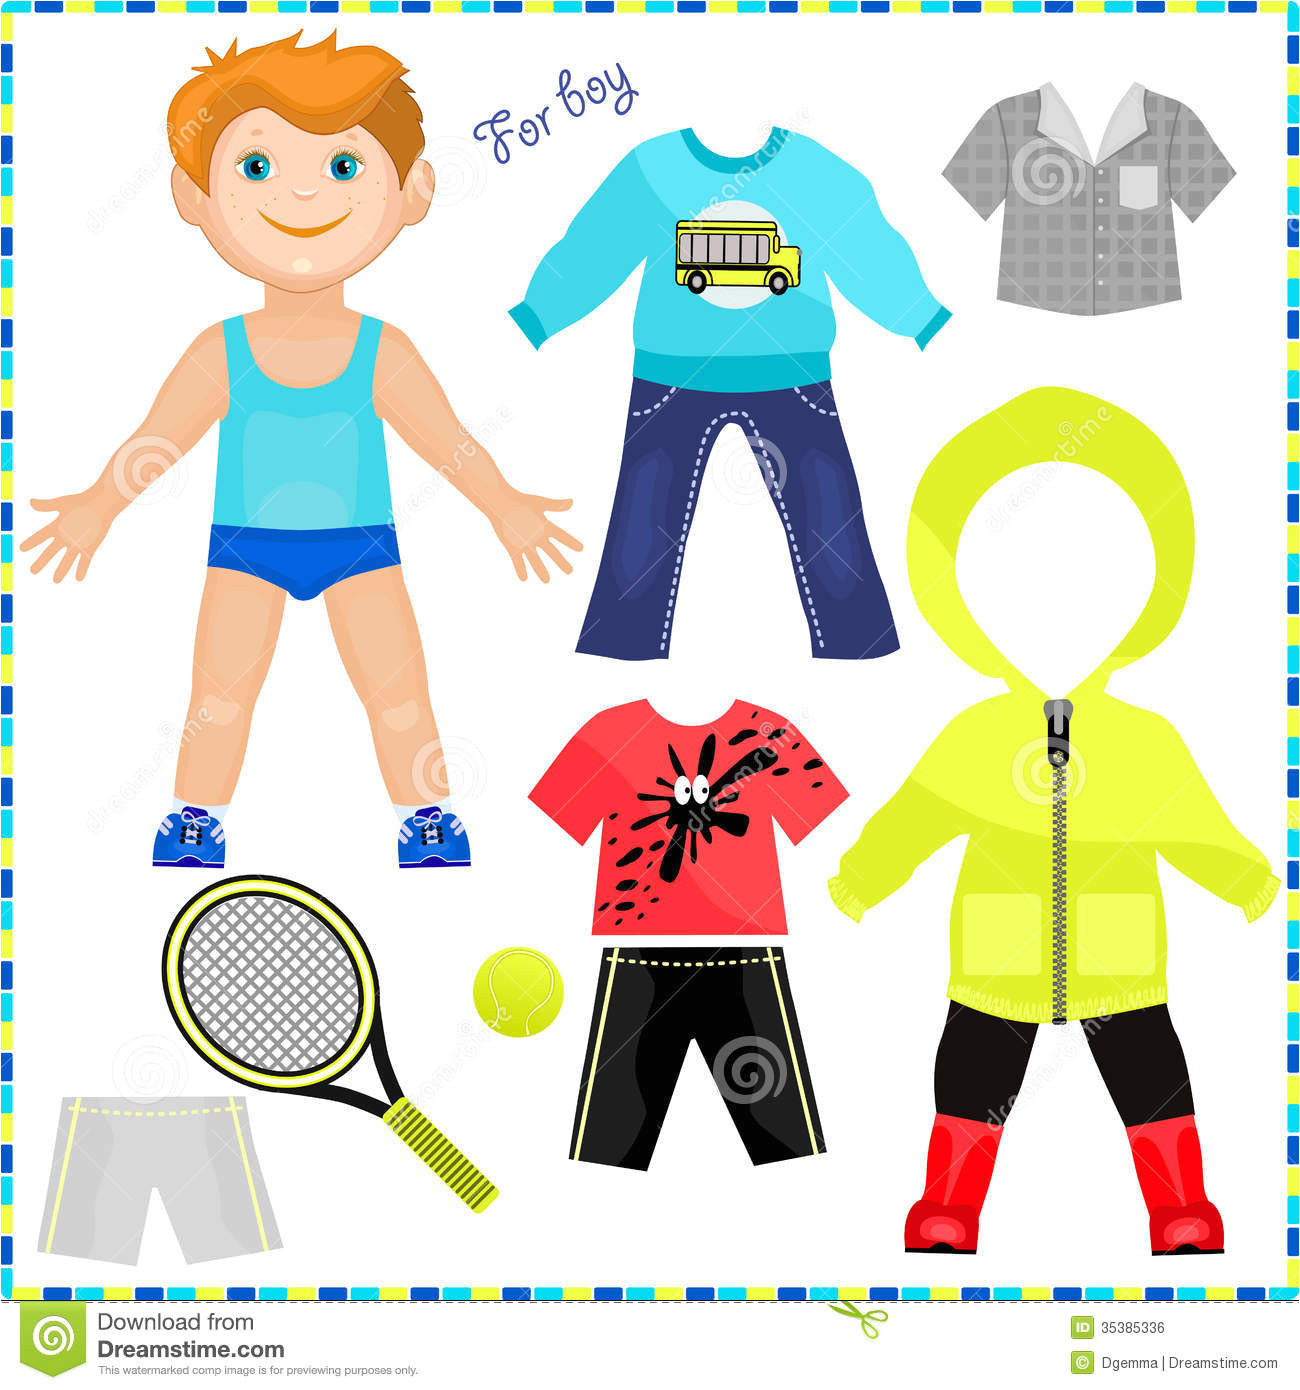 post printable boy clothes 87411